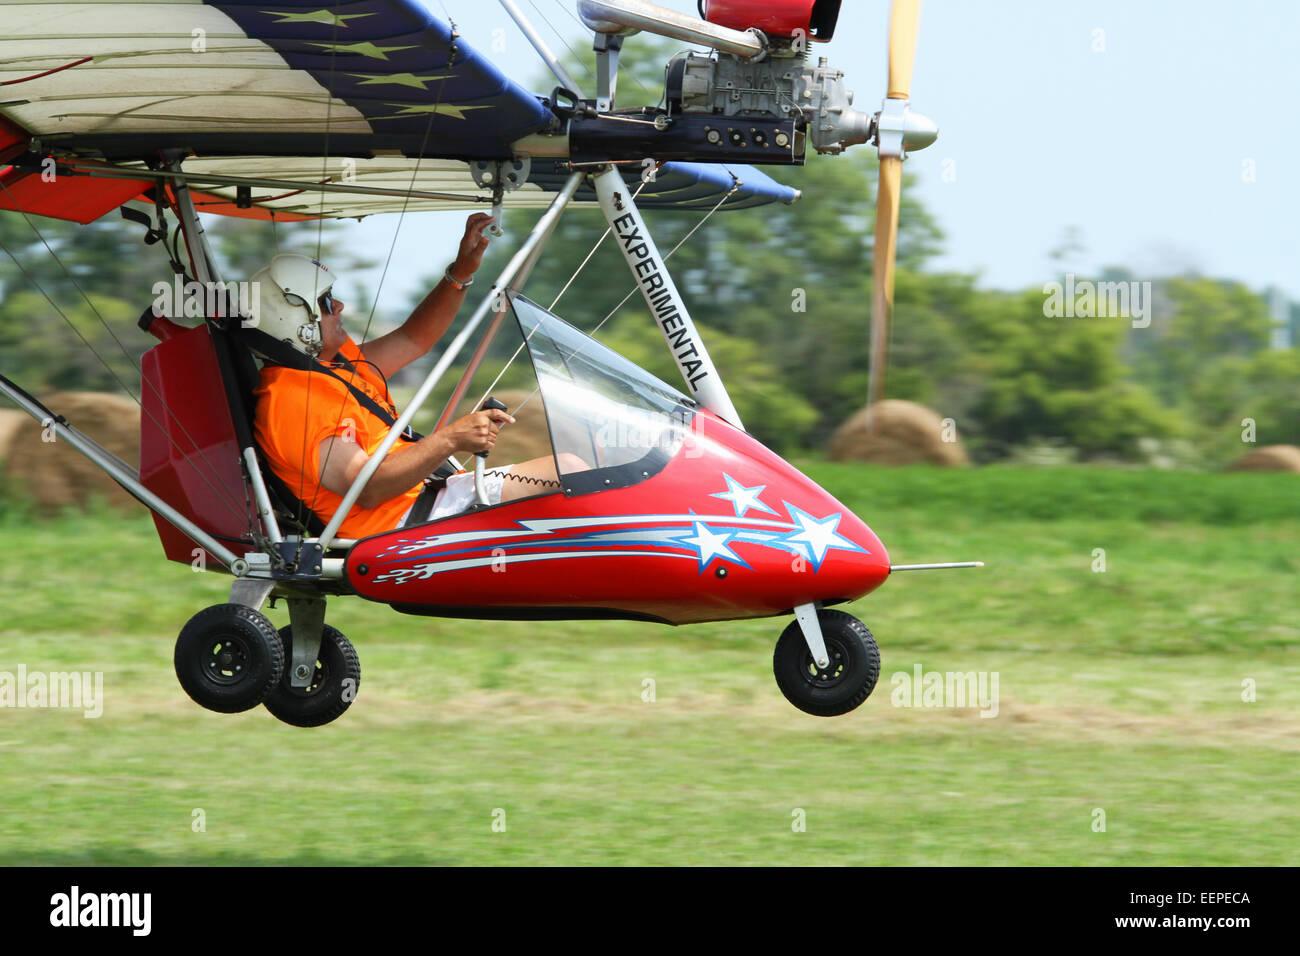 Microlight Aircraft Ultralight Aeroplane Stock Photos & Microlight